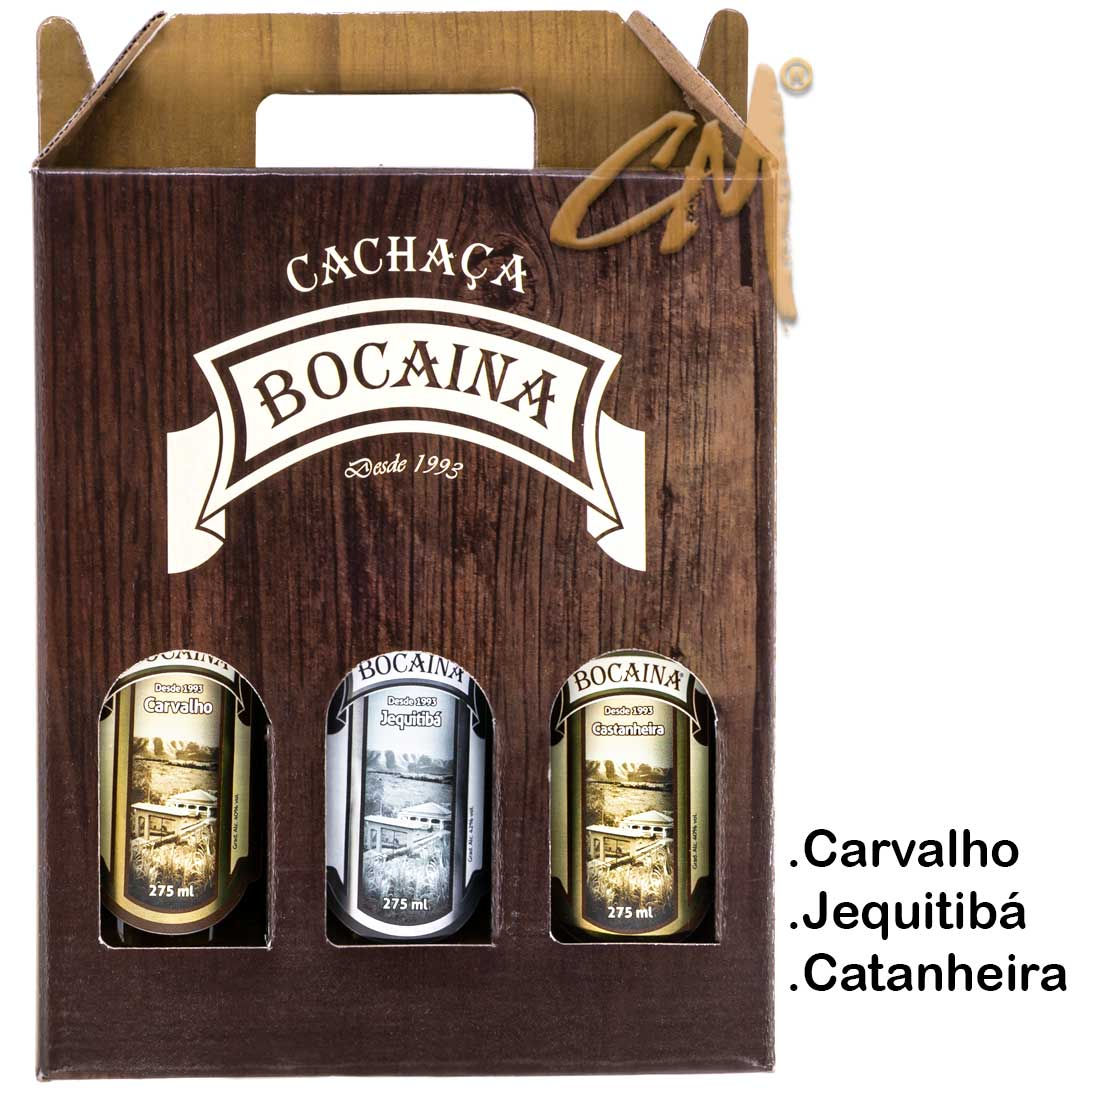 Cachaça Bocaina 275 ml - Kit Carvalho-Jequitiba-Castanheira  (Lavras - MG)